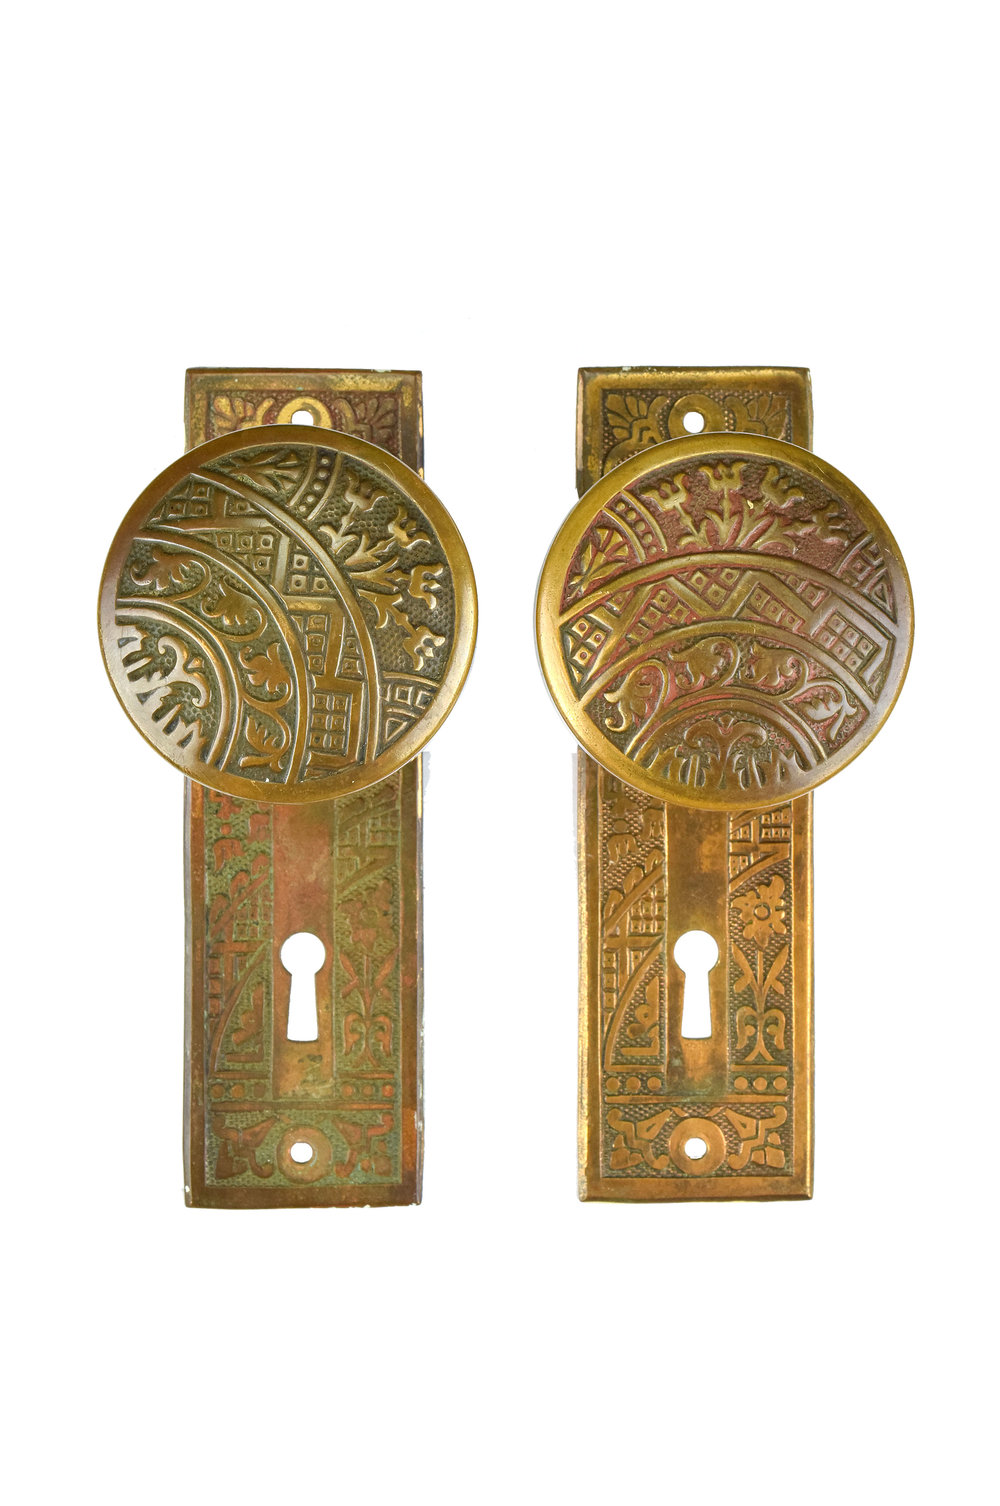 EASTLAKE BRASS KNOB SET AA# H20119   2 sets available $265.00 each set